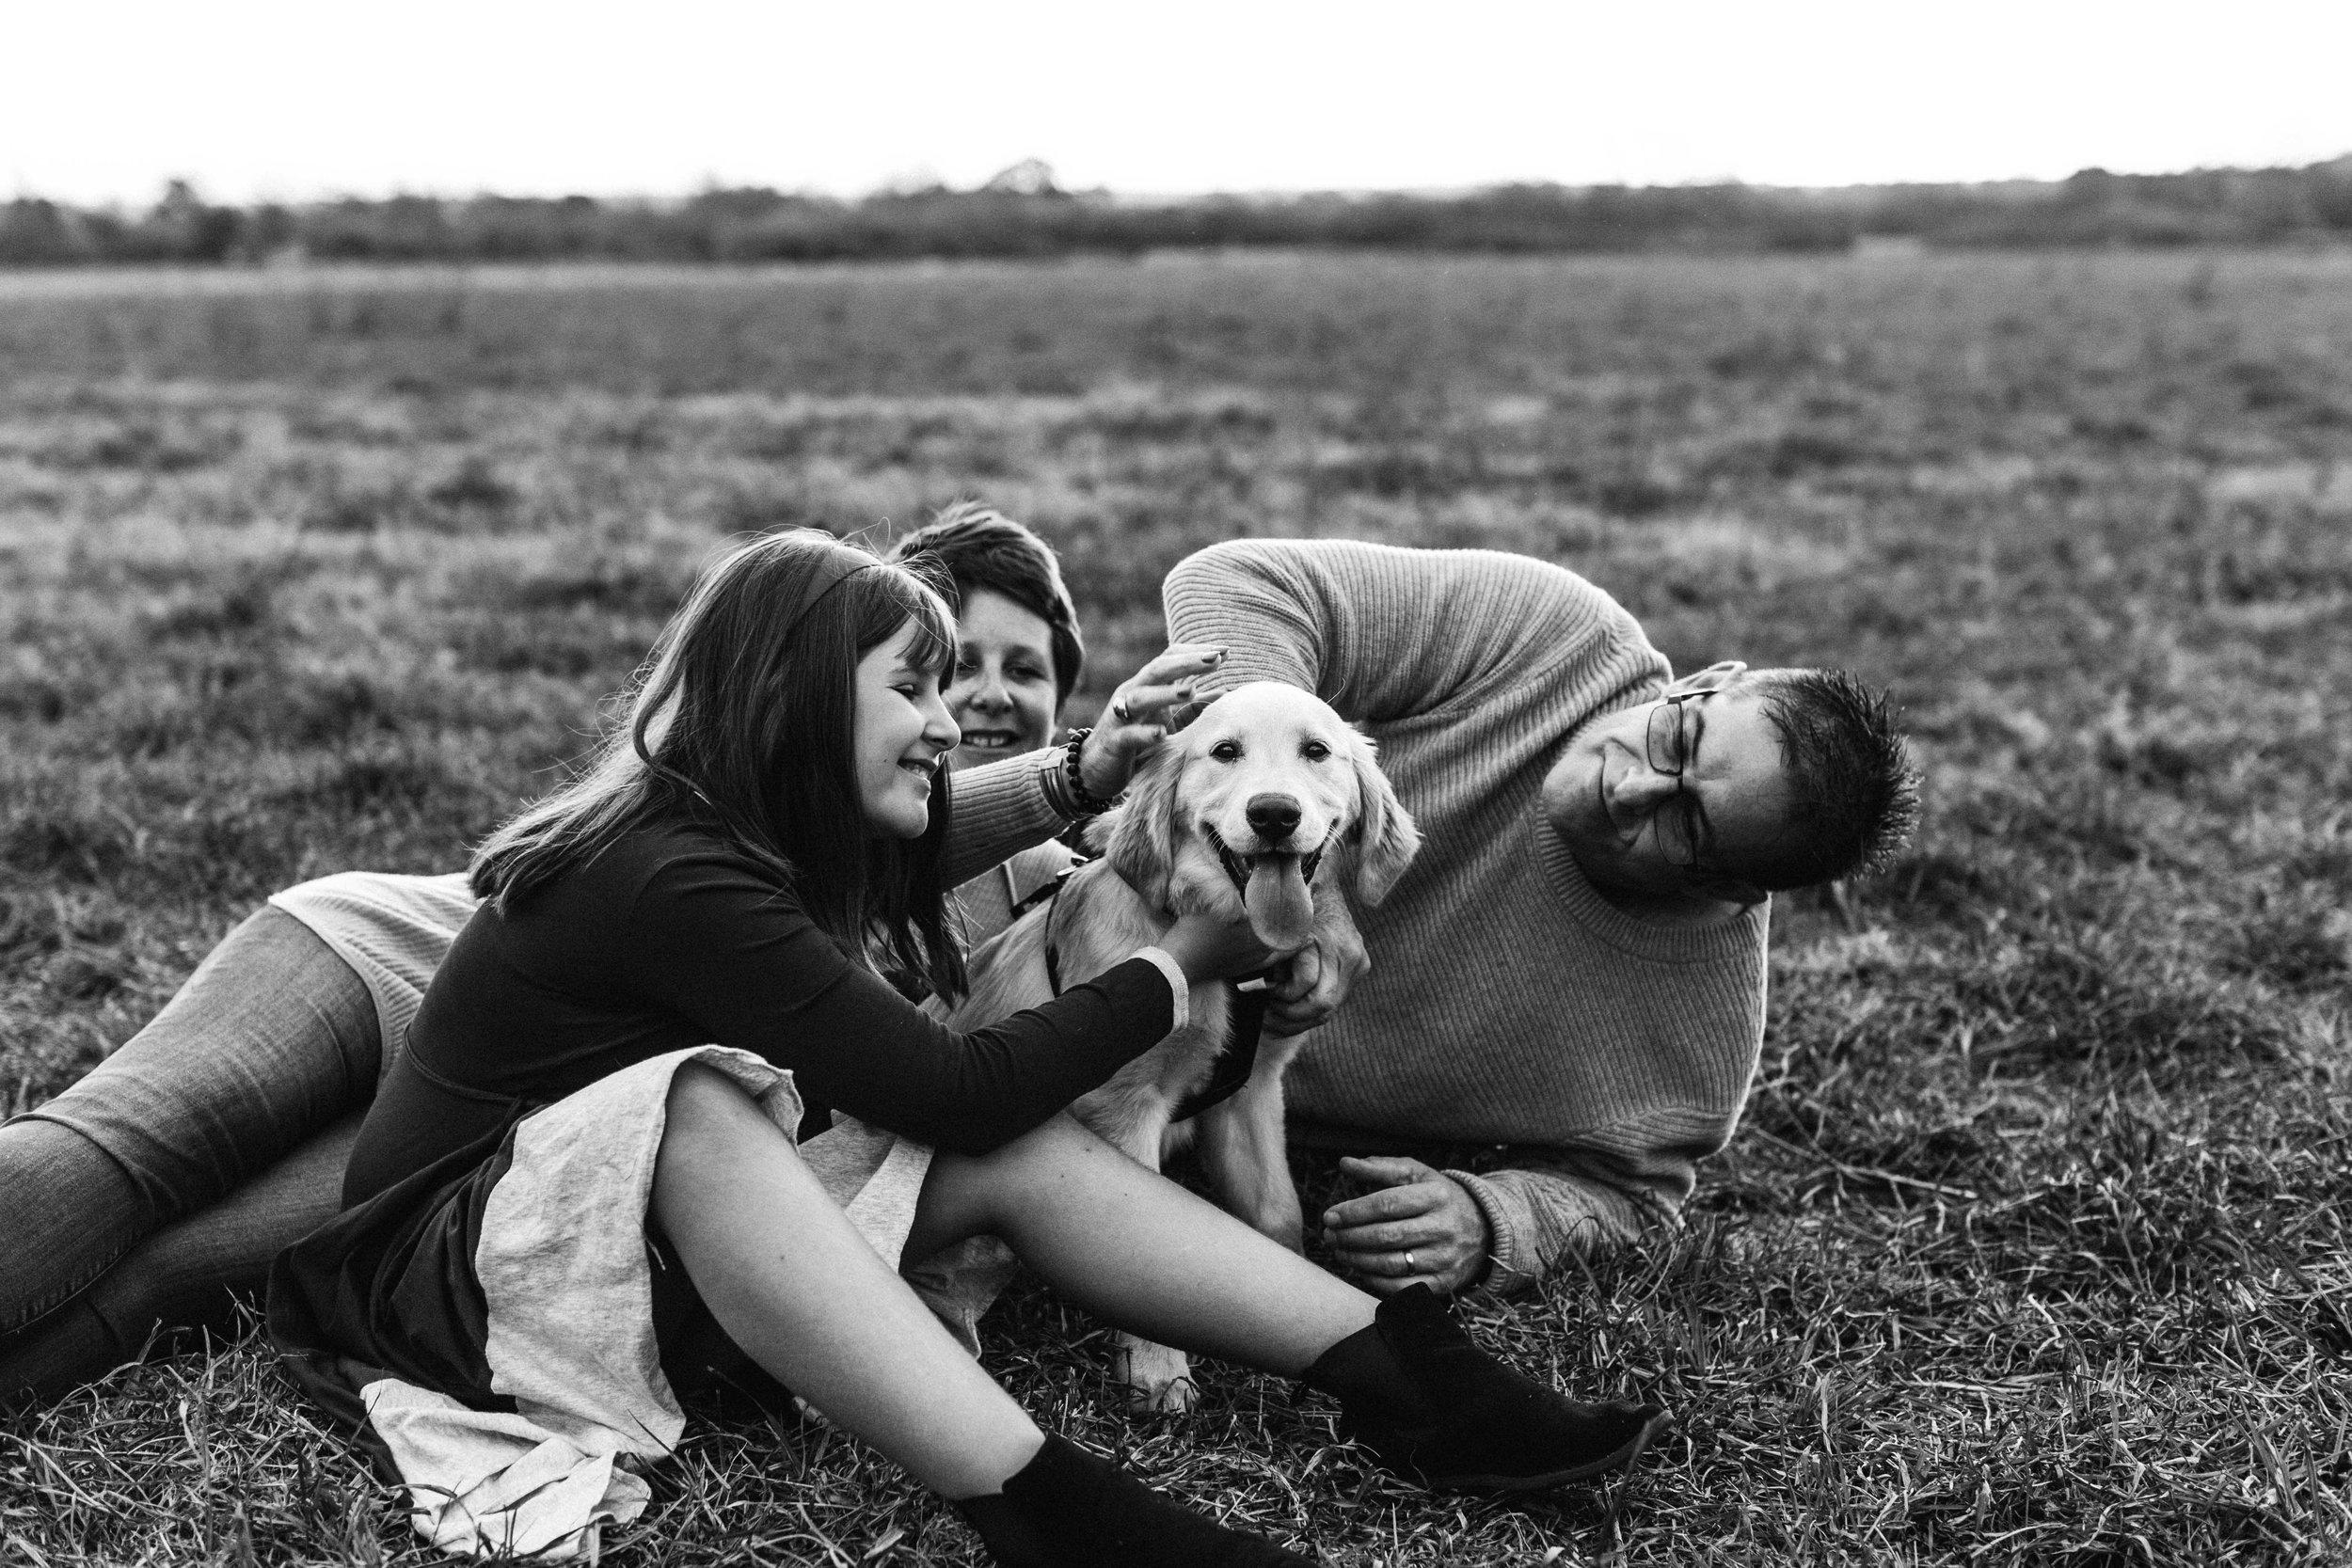 camden-macarthur-family-photography-www.emilyobrienphotography.net-36.jpg